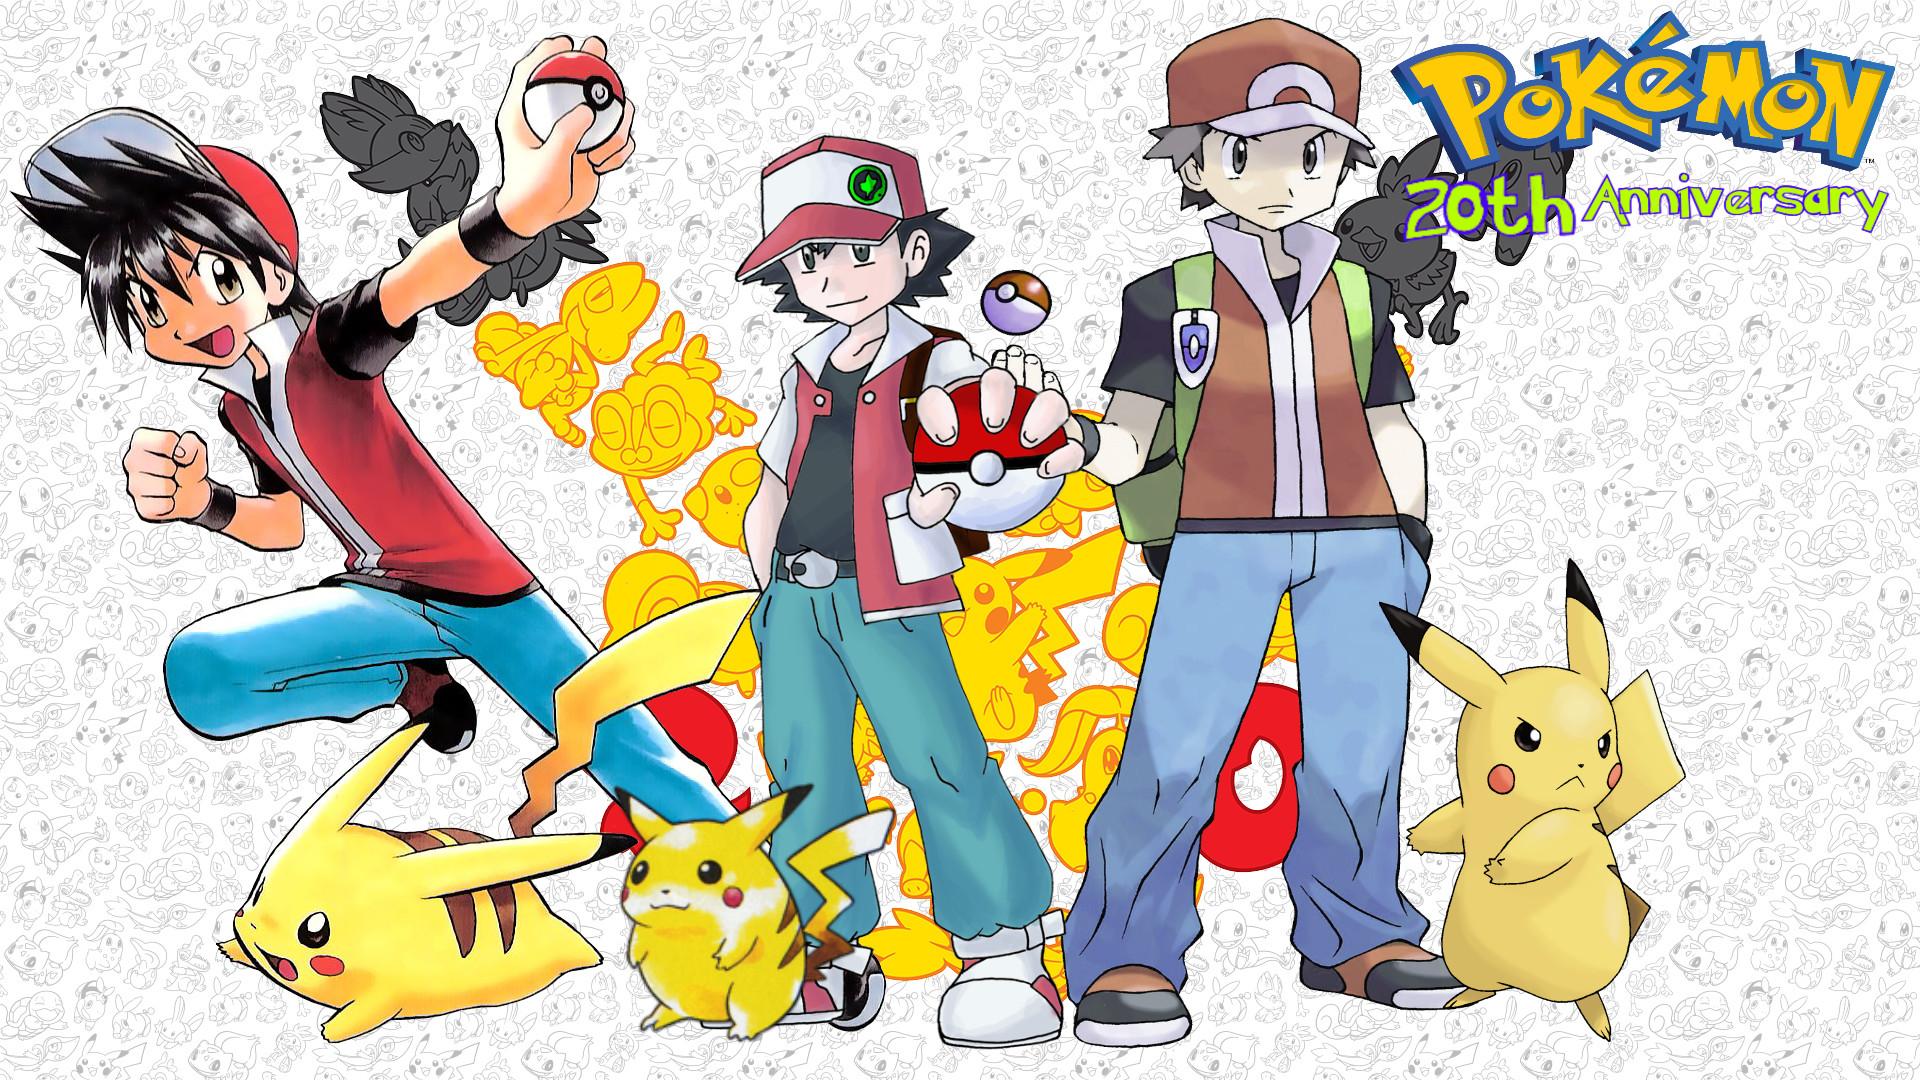 … Pokemon 20th Anniversary PKMN Trainer Red by MattPlaysVG